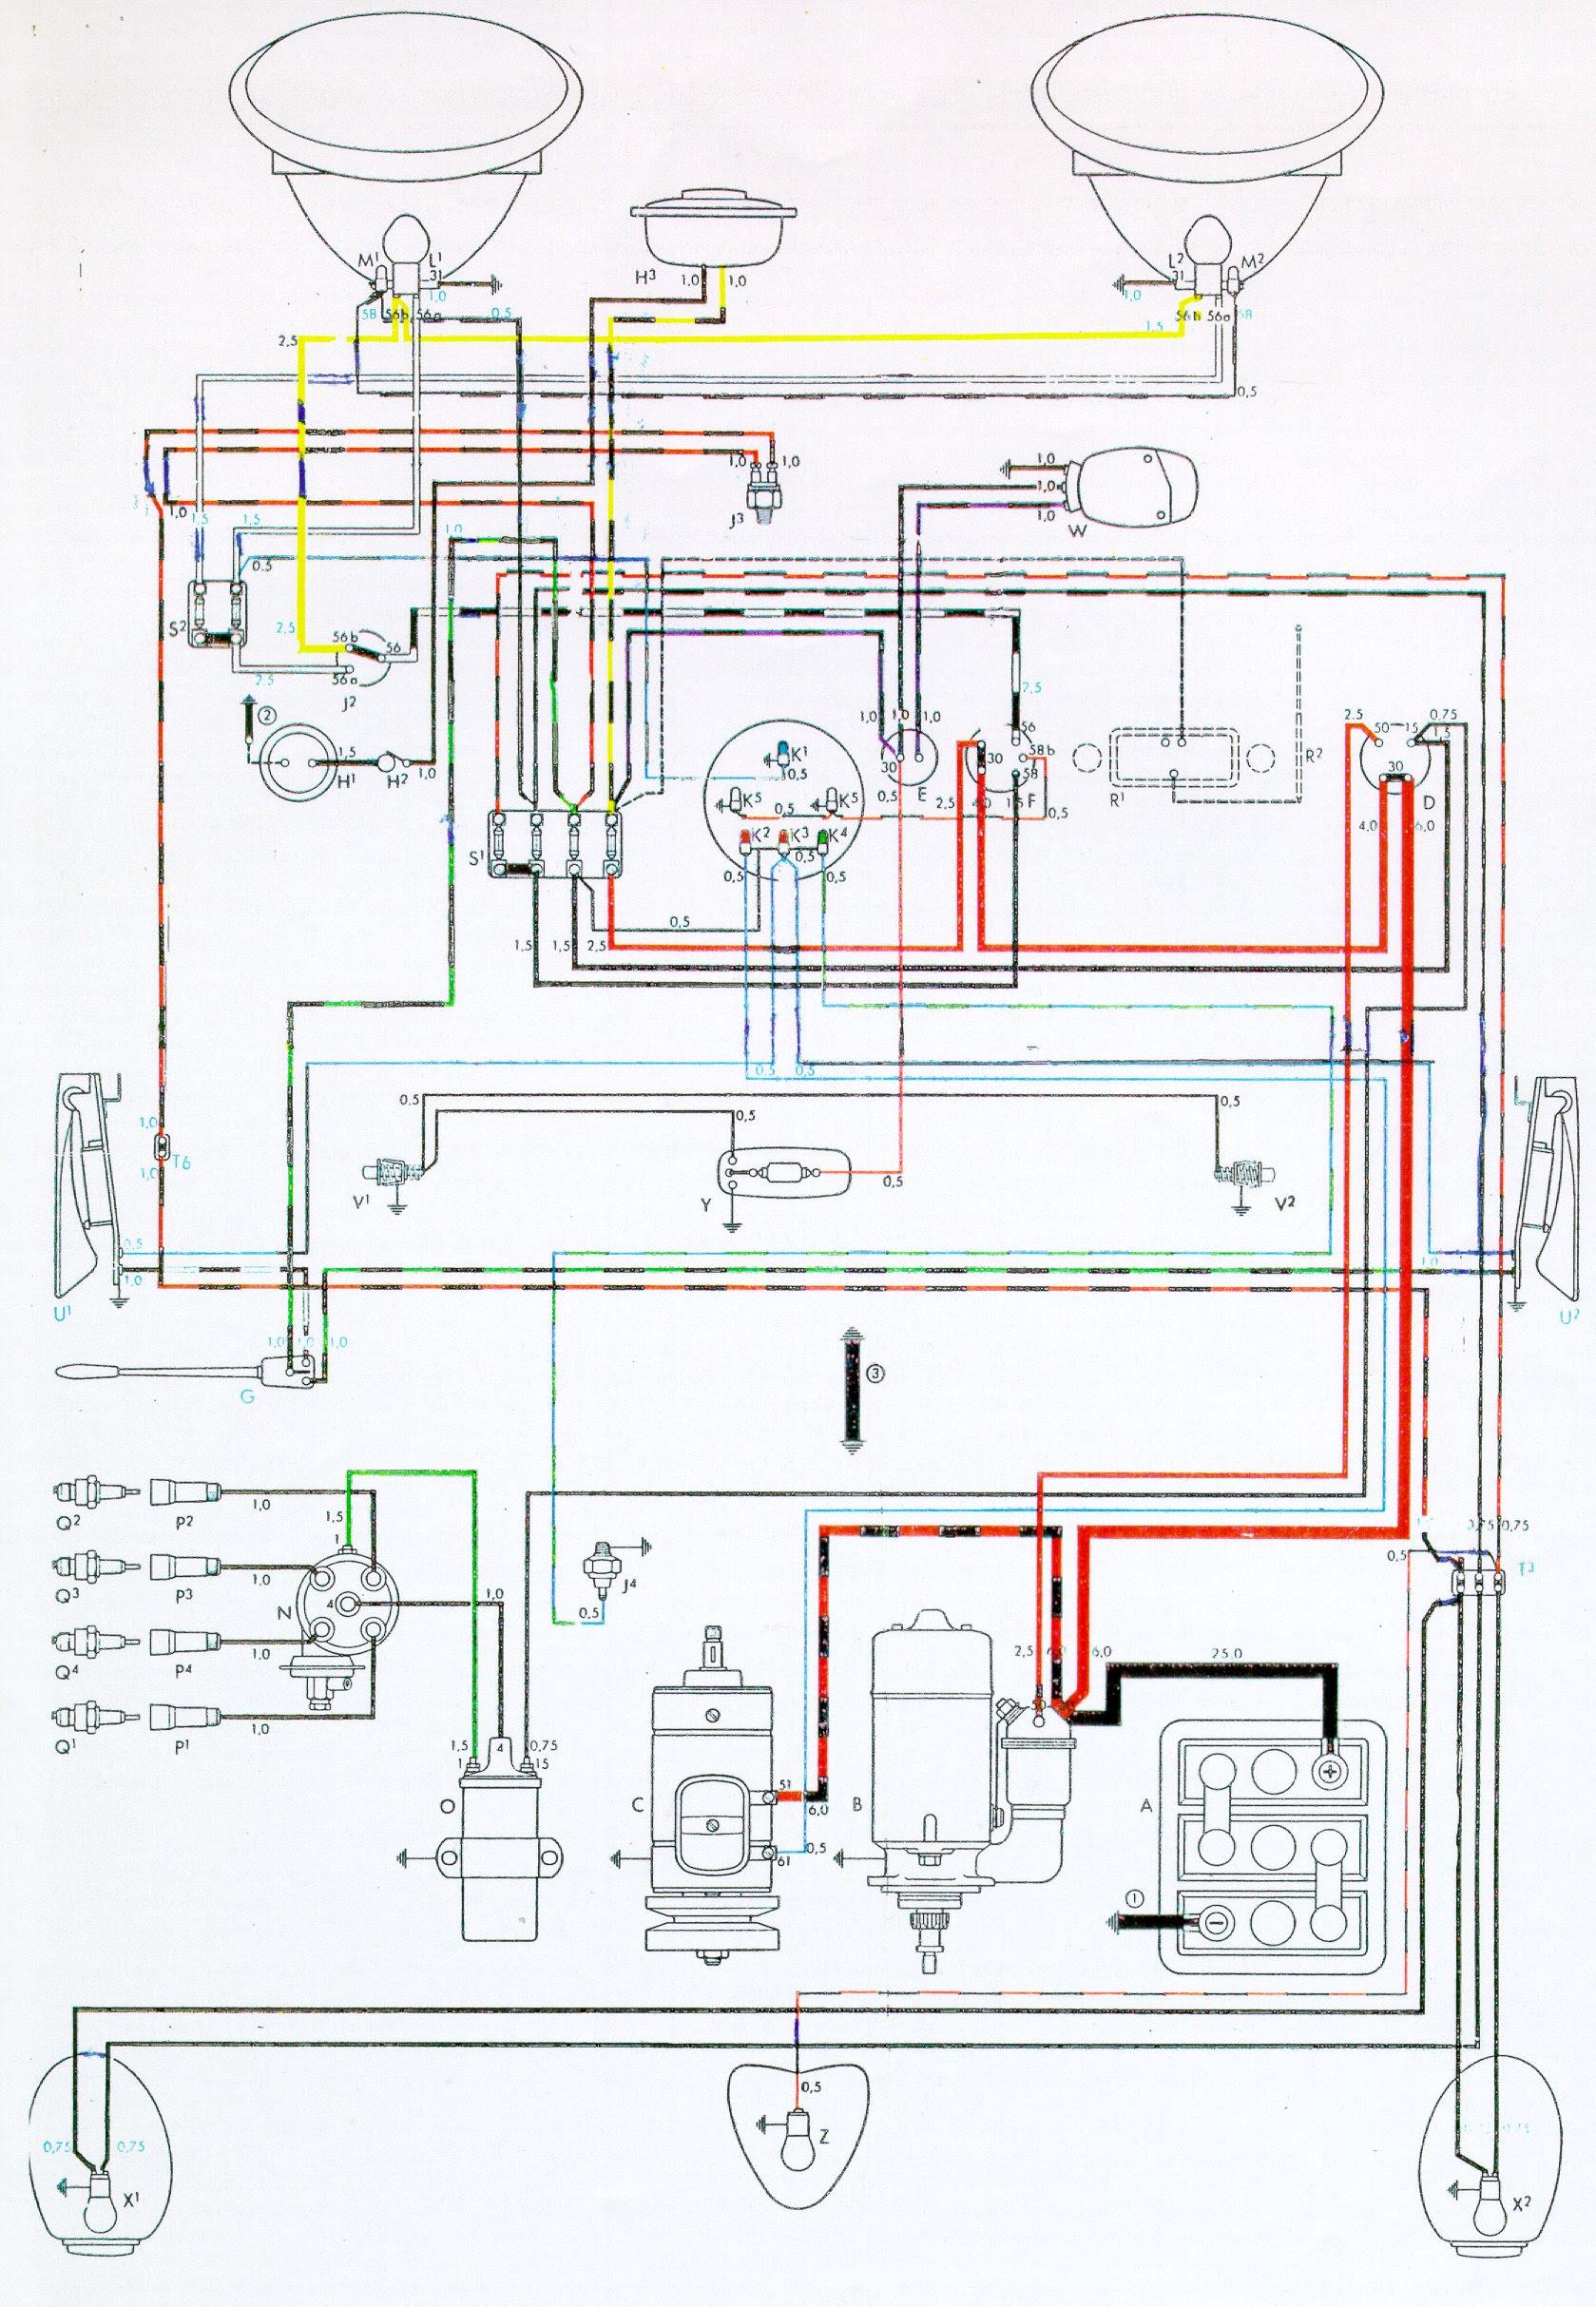 1967 Vw Bug Alternator Wiring Diagram Bege Wiring Diagram